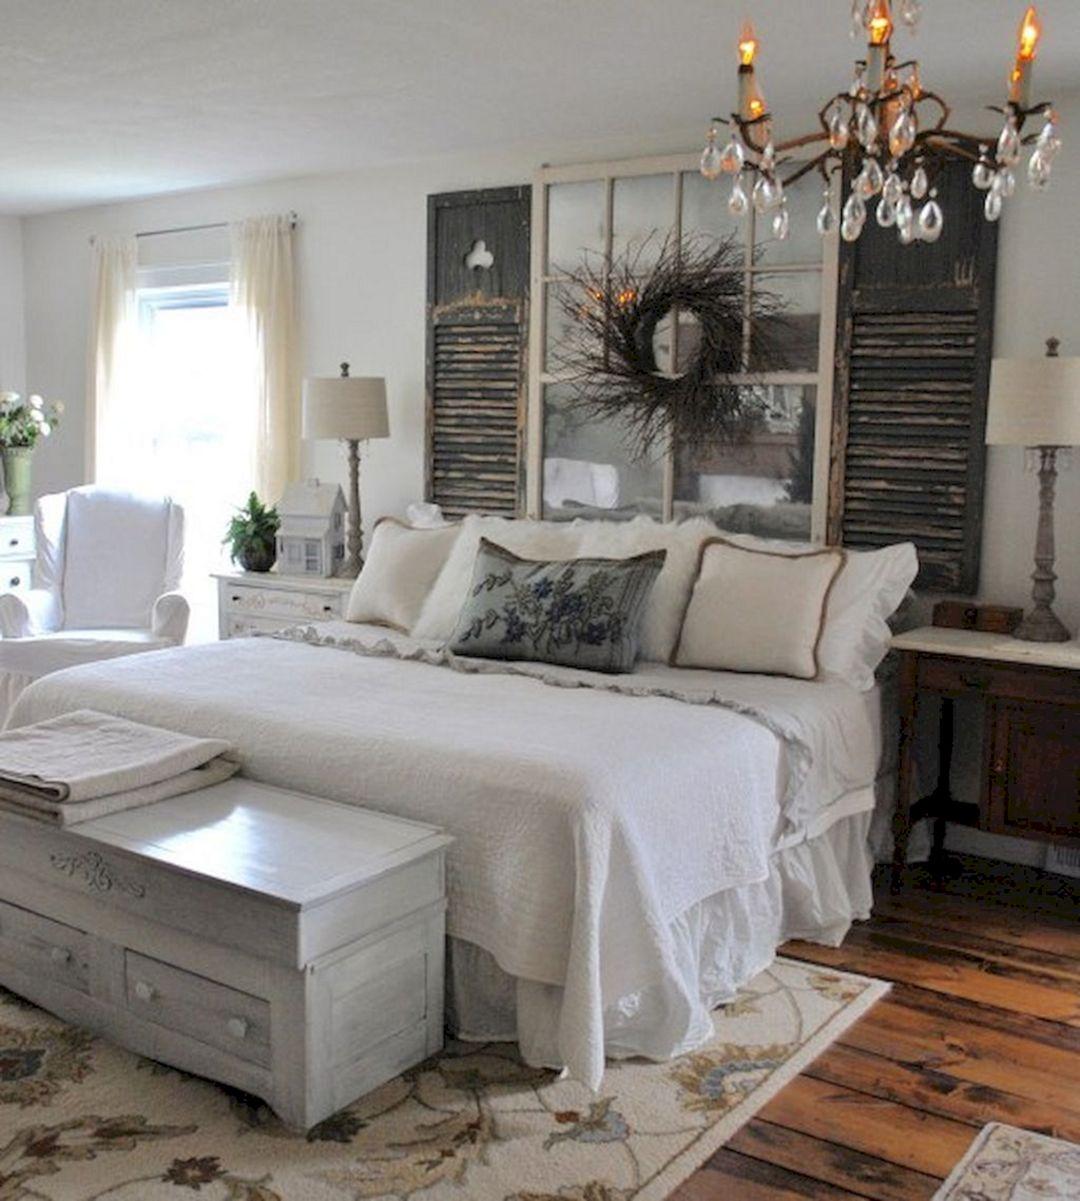 Rustic Farmhouse Style Master Bedroom Ideas 23 - DECOREDO on Master Bedroom Farmhouse Bedroom Images  id=28065